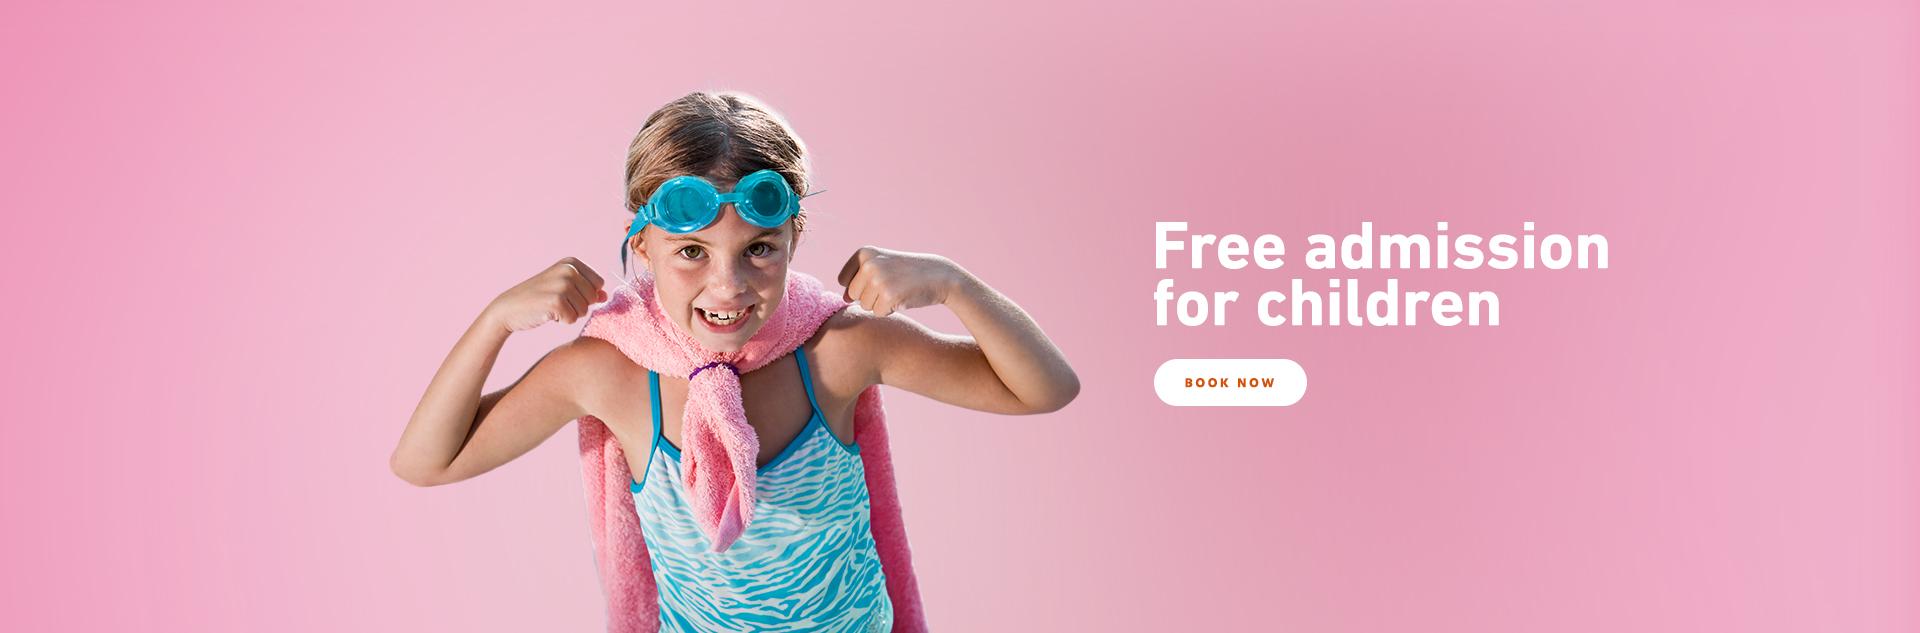 Nens gratis caldea